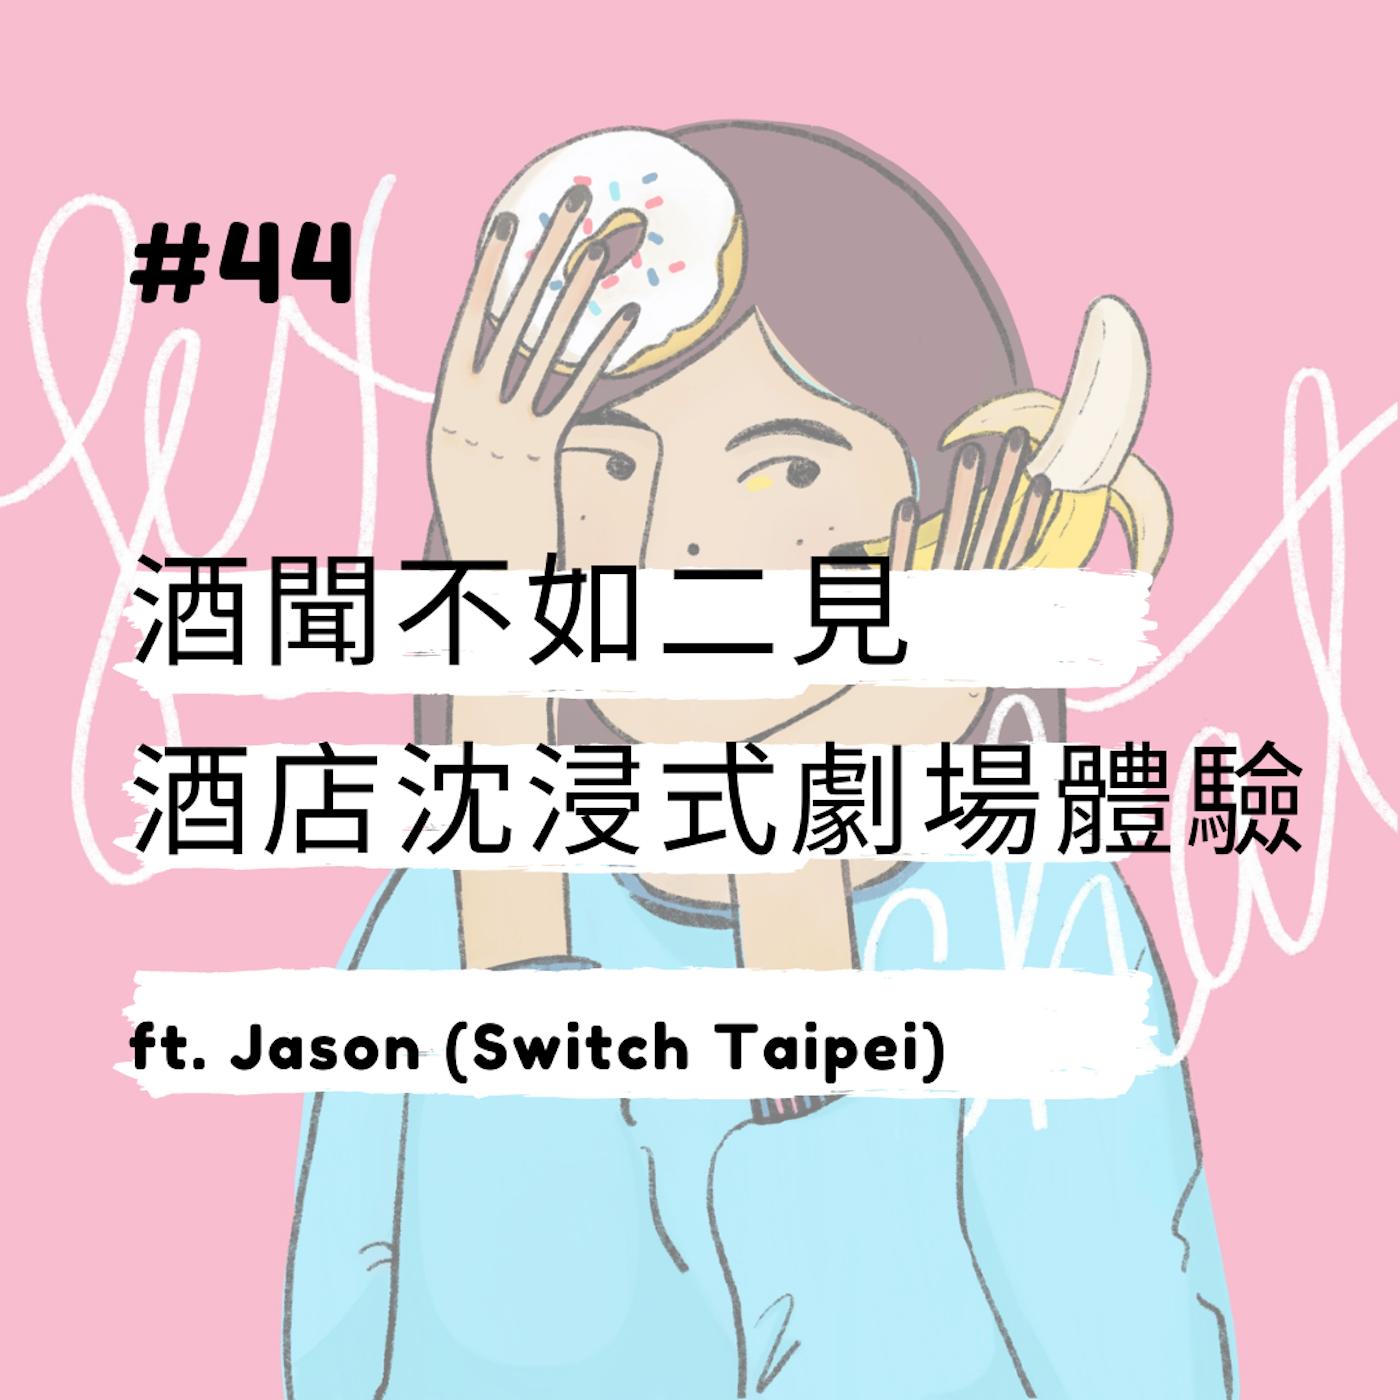 Sex Chat podcast #44 酒聞不如二見 酒店沈浸式劇場體驗 ft. Jason (Switch Taipei)